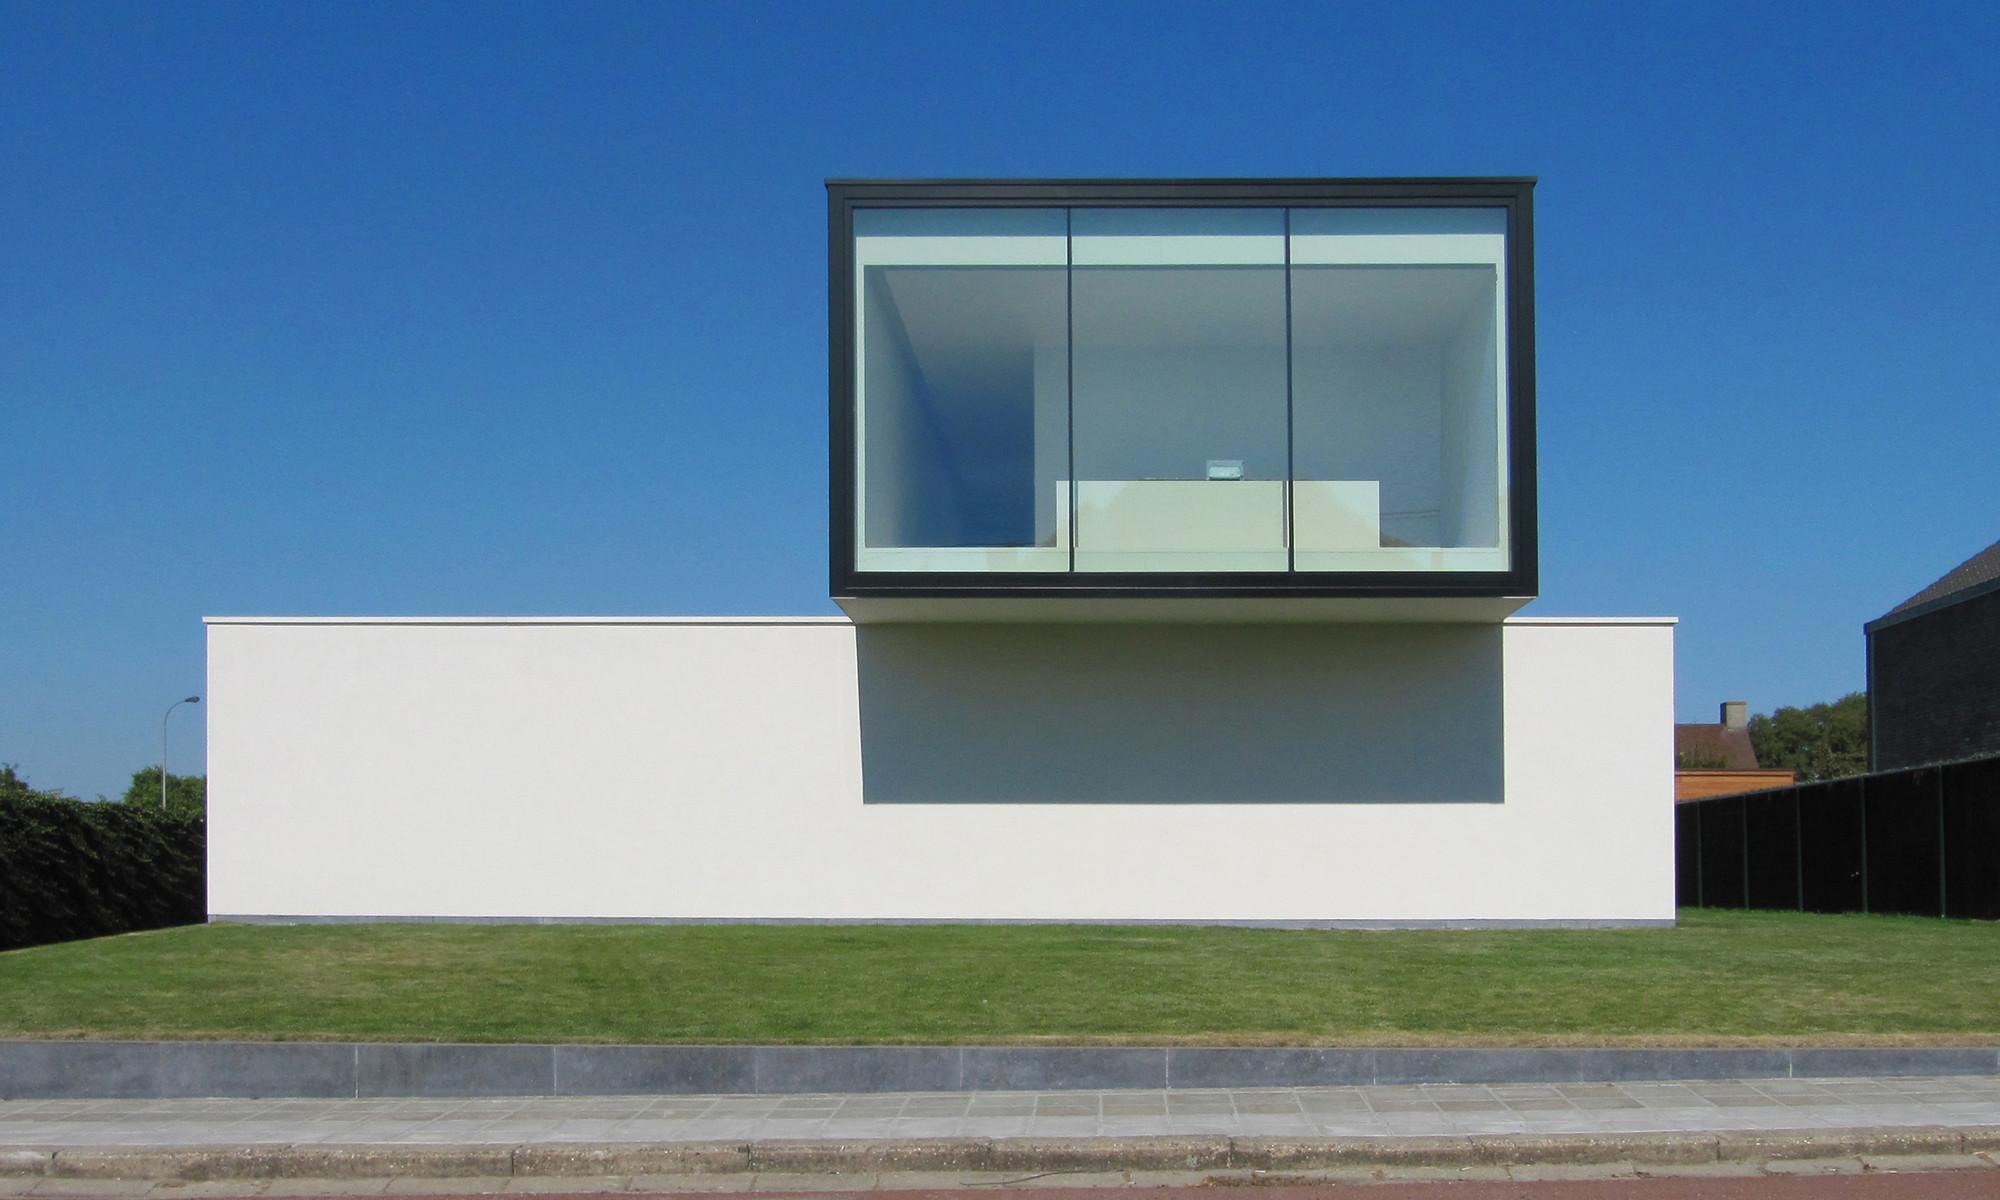 House VRT – Tielt / DE JAEGHERE Architectuuratelier, Courtesy of Steven De Jaeghere